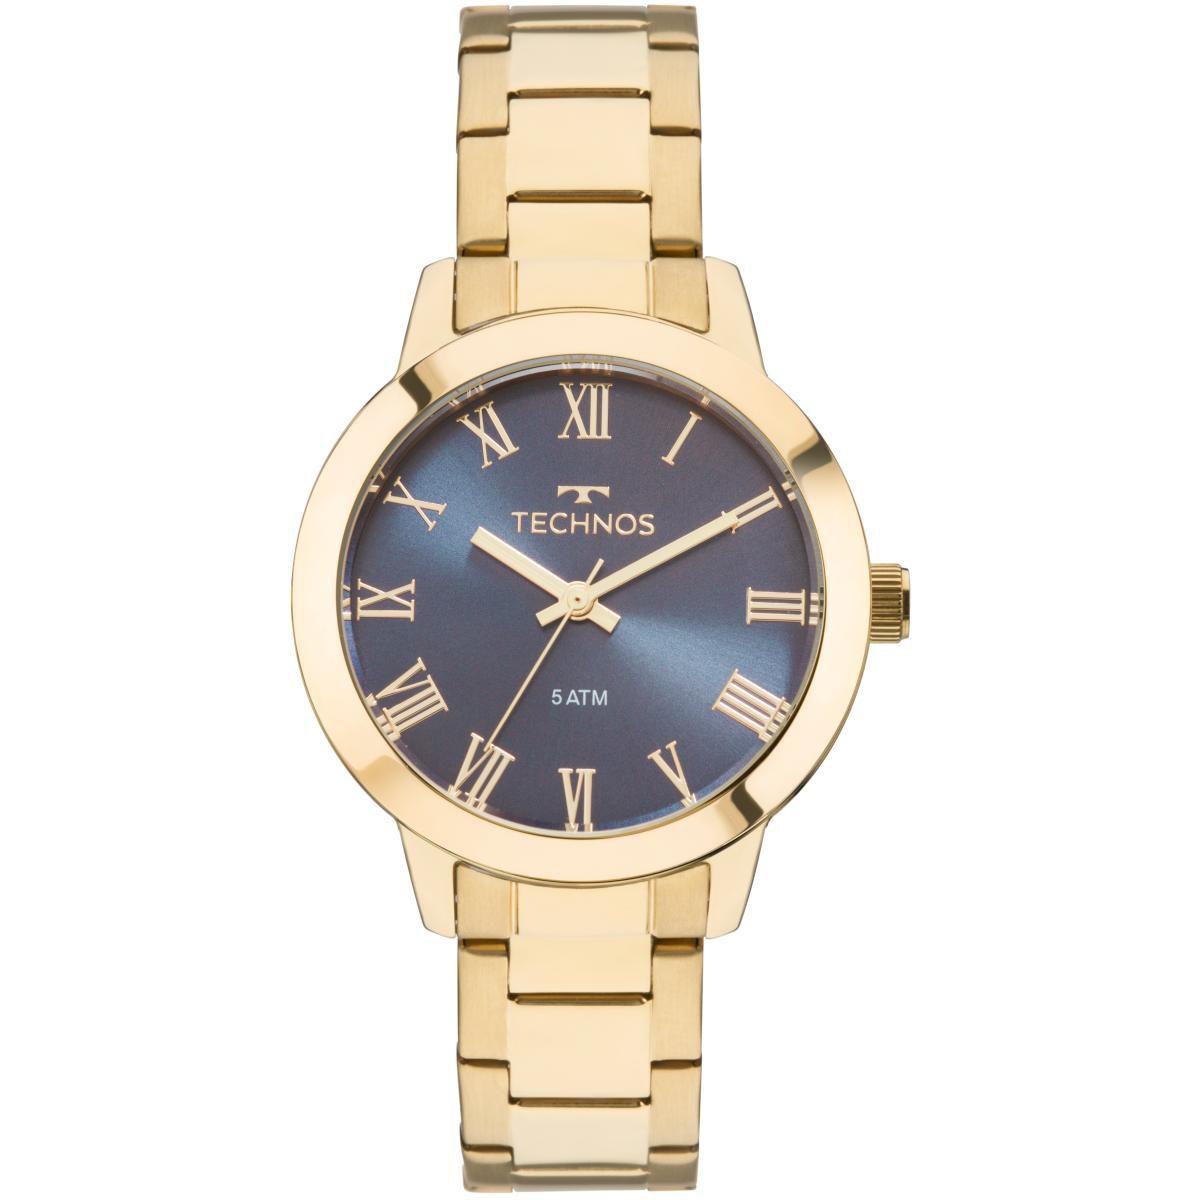 Relógio Feminino Technos Boutique 2035MKU/4A Pulseira Aço Dourada